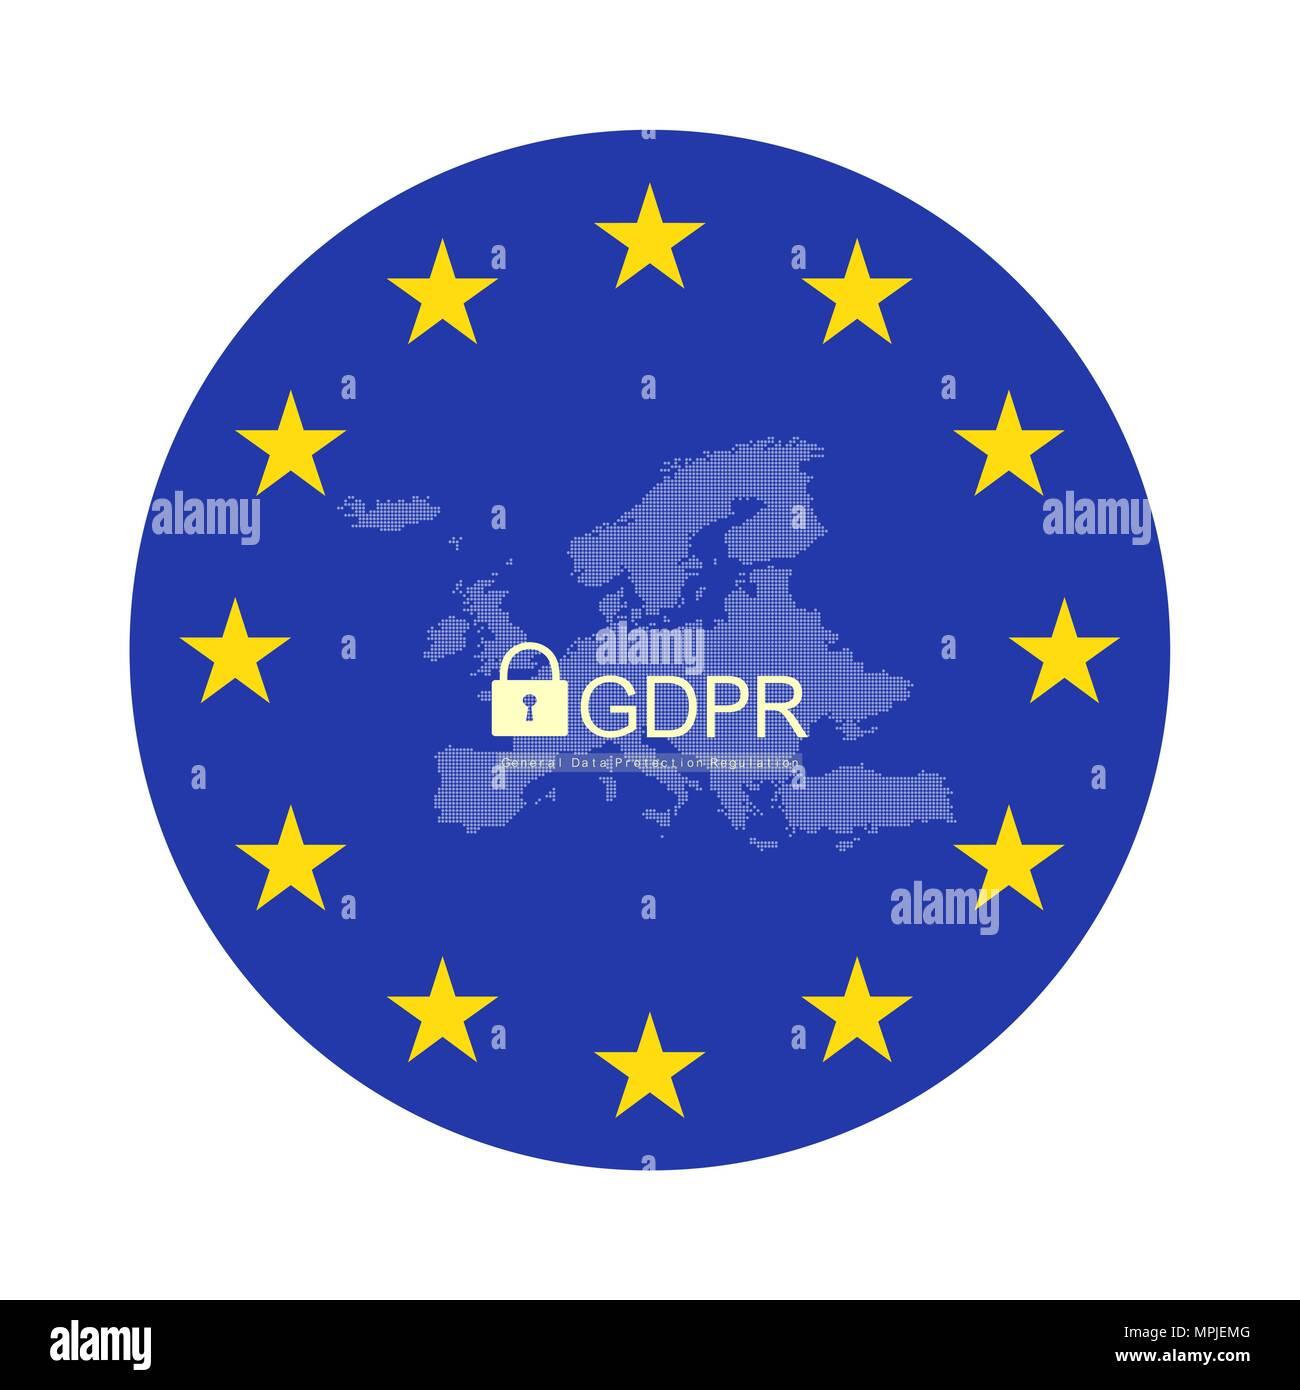 General Data Protection Regulation, GDPR. European GDPR concept flyer template. Vector illustration - Stock Image